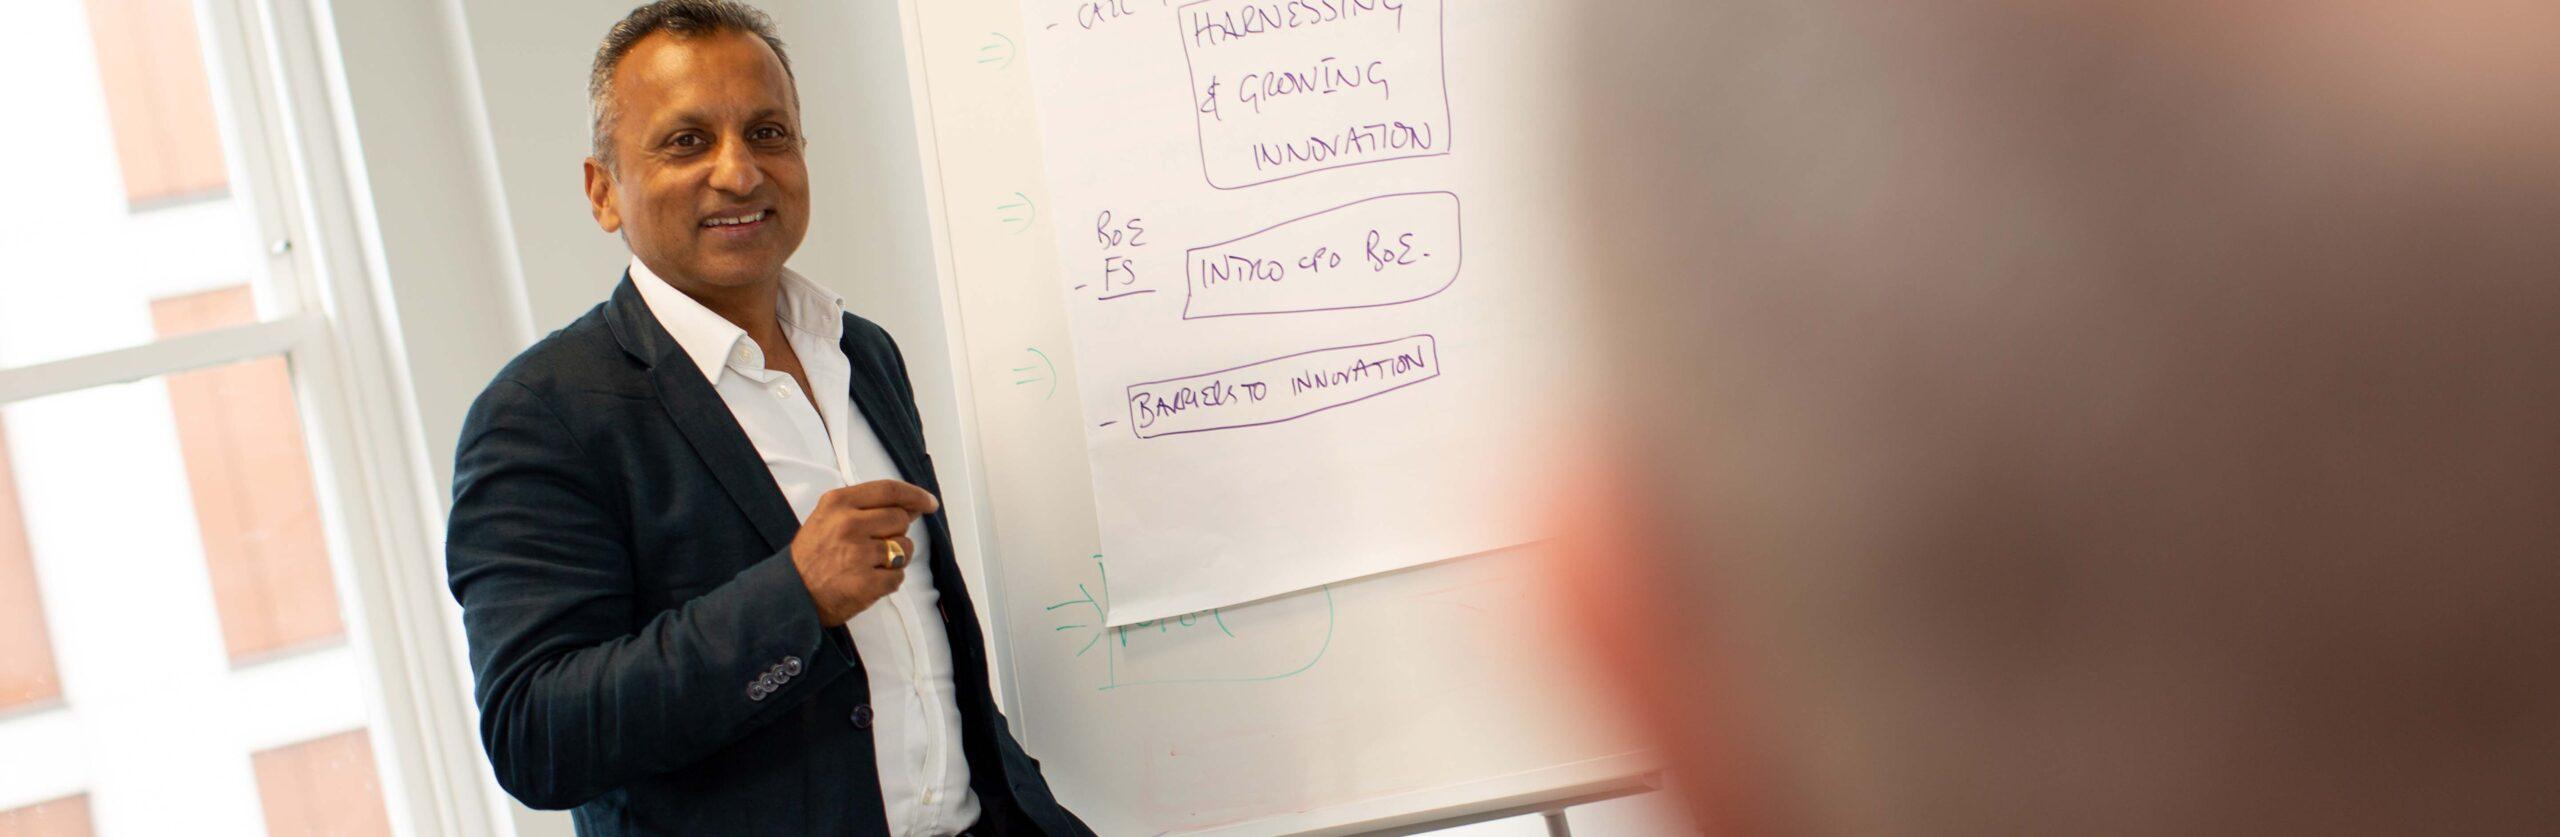 Business Coaching Franchise Cost - Marketing